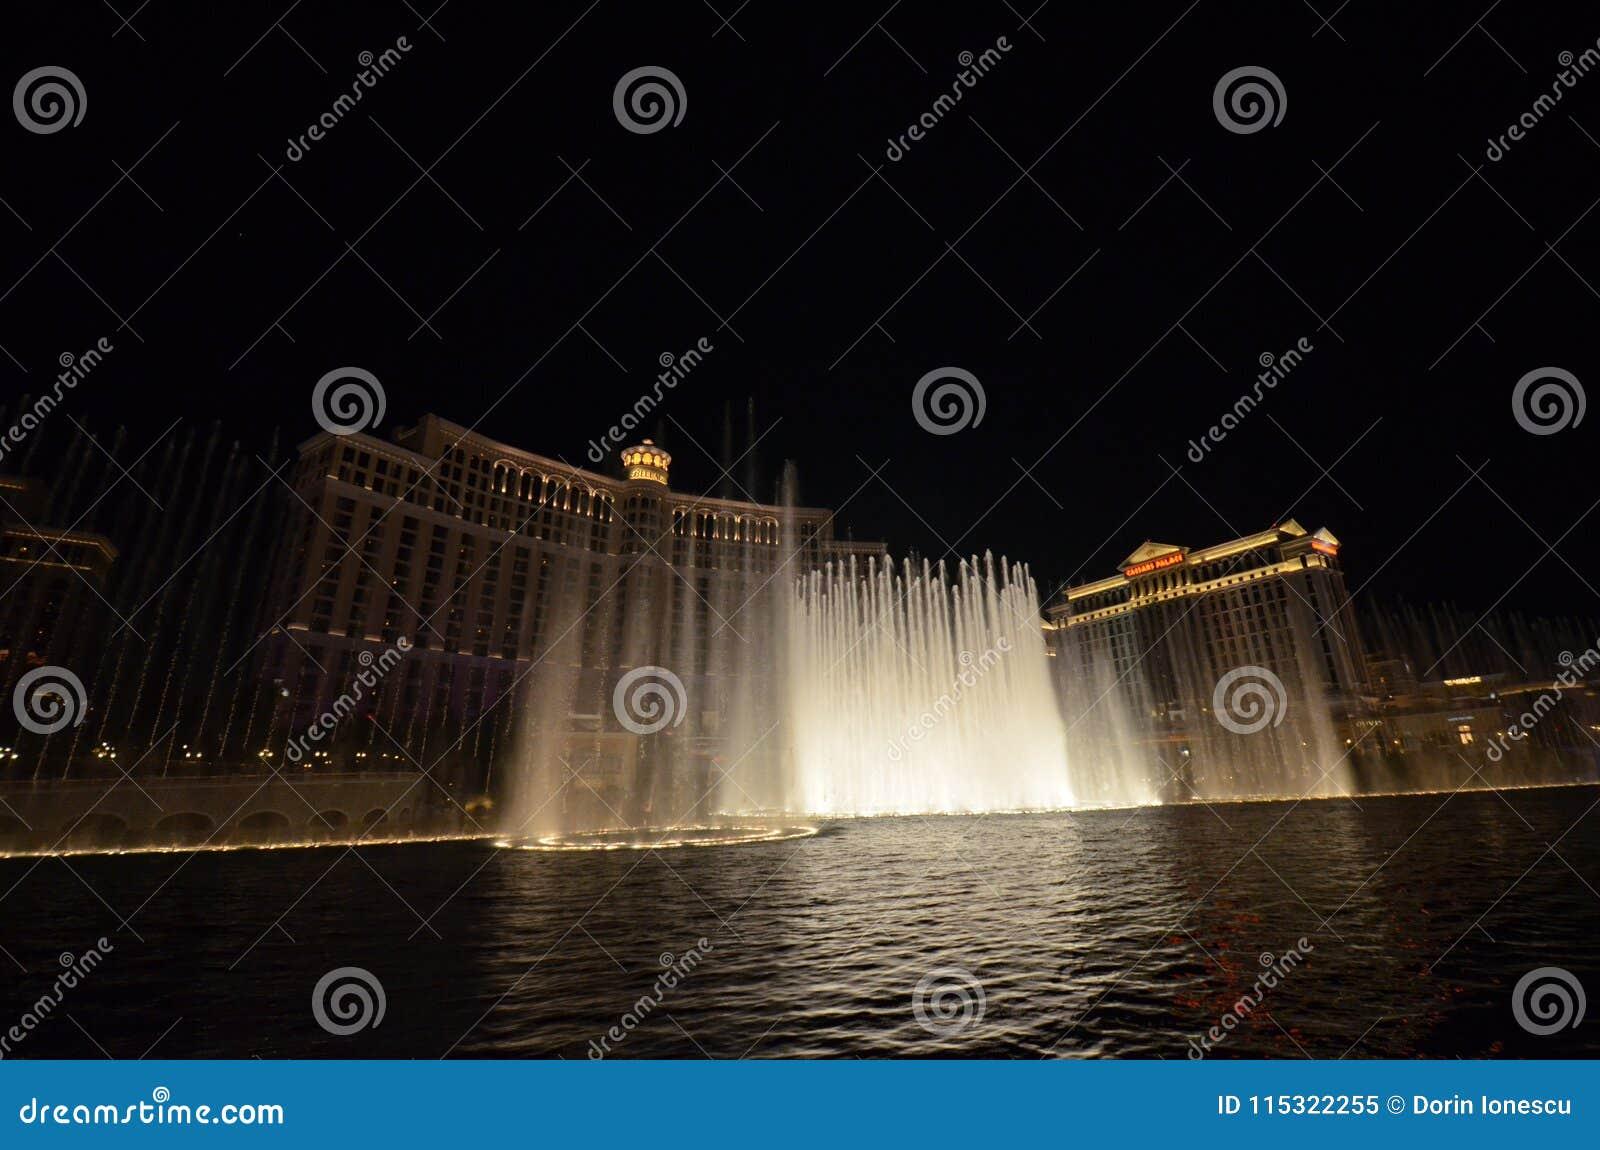 Bellagio Hotel and Casino, Bellagio, water, fountain, landmark, night